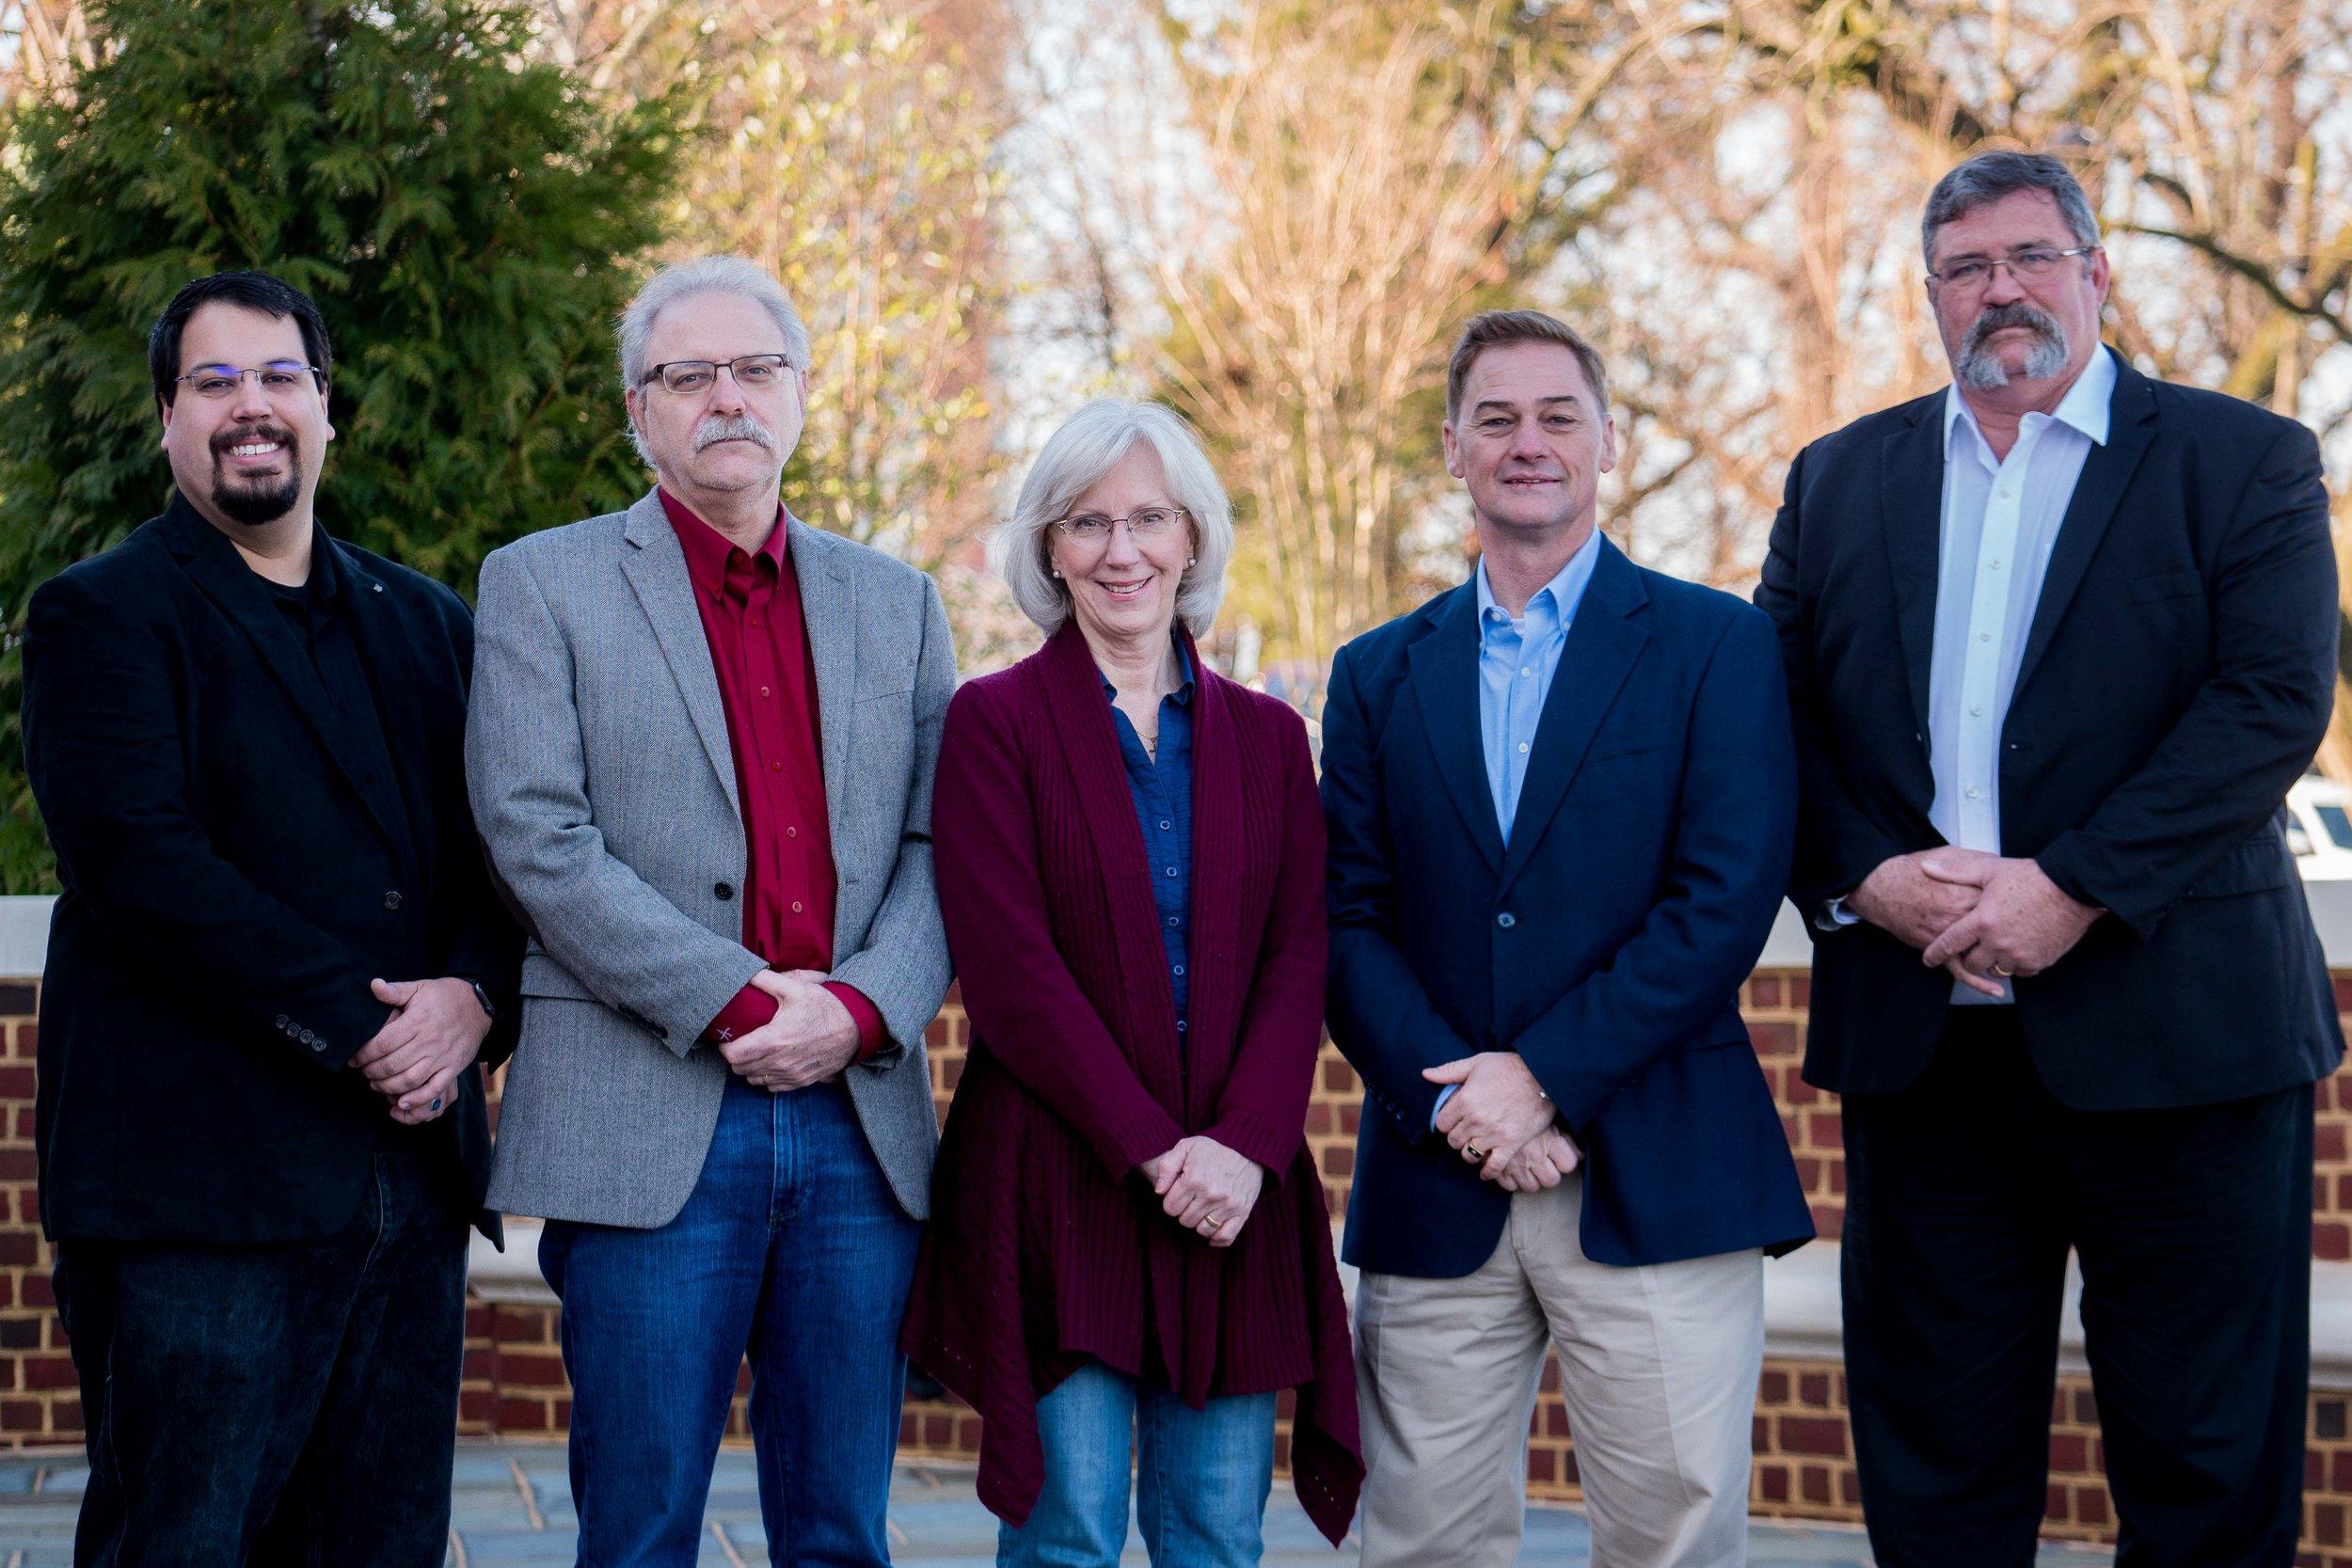 (From Left to Right) Jonathan Giles, Jerry Bogacz, Kathy Bogacz, James Cook & Stephen Parke